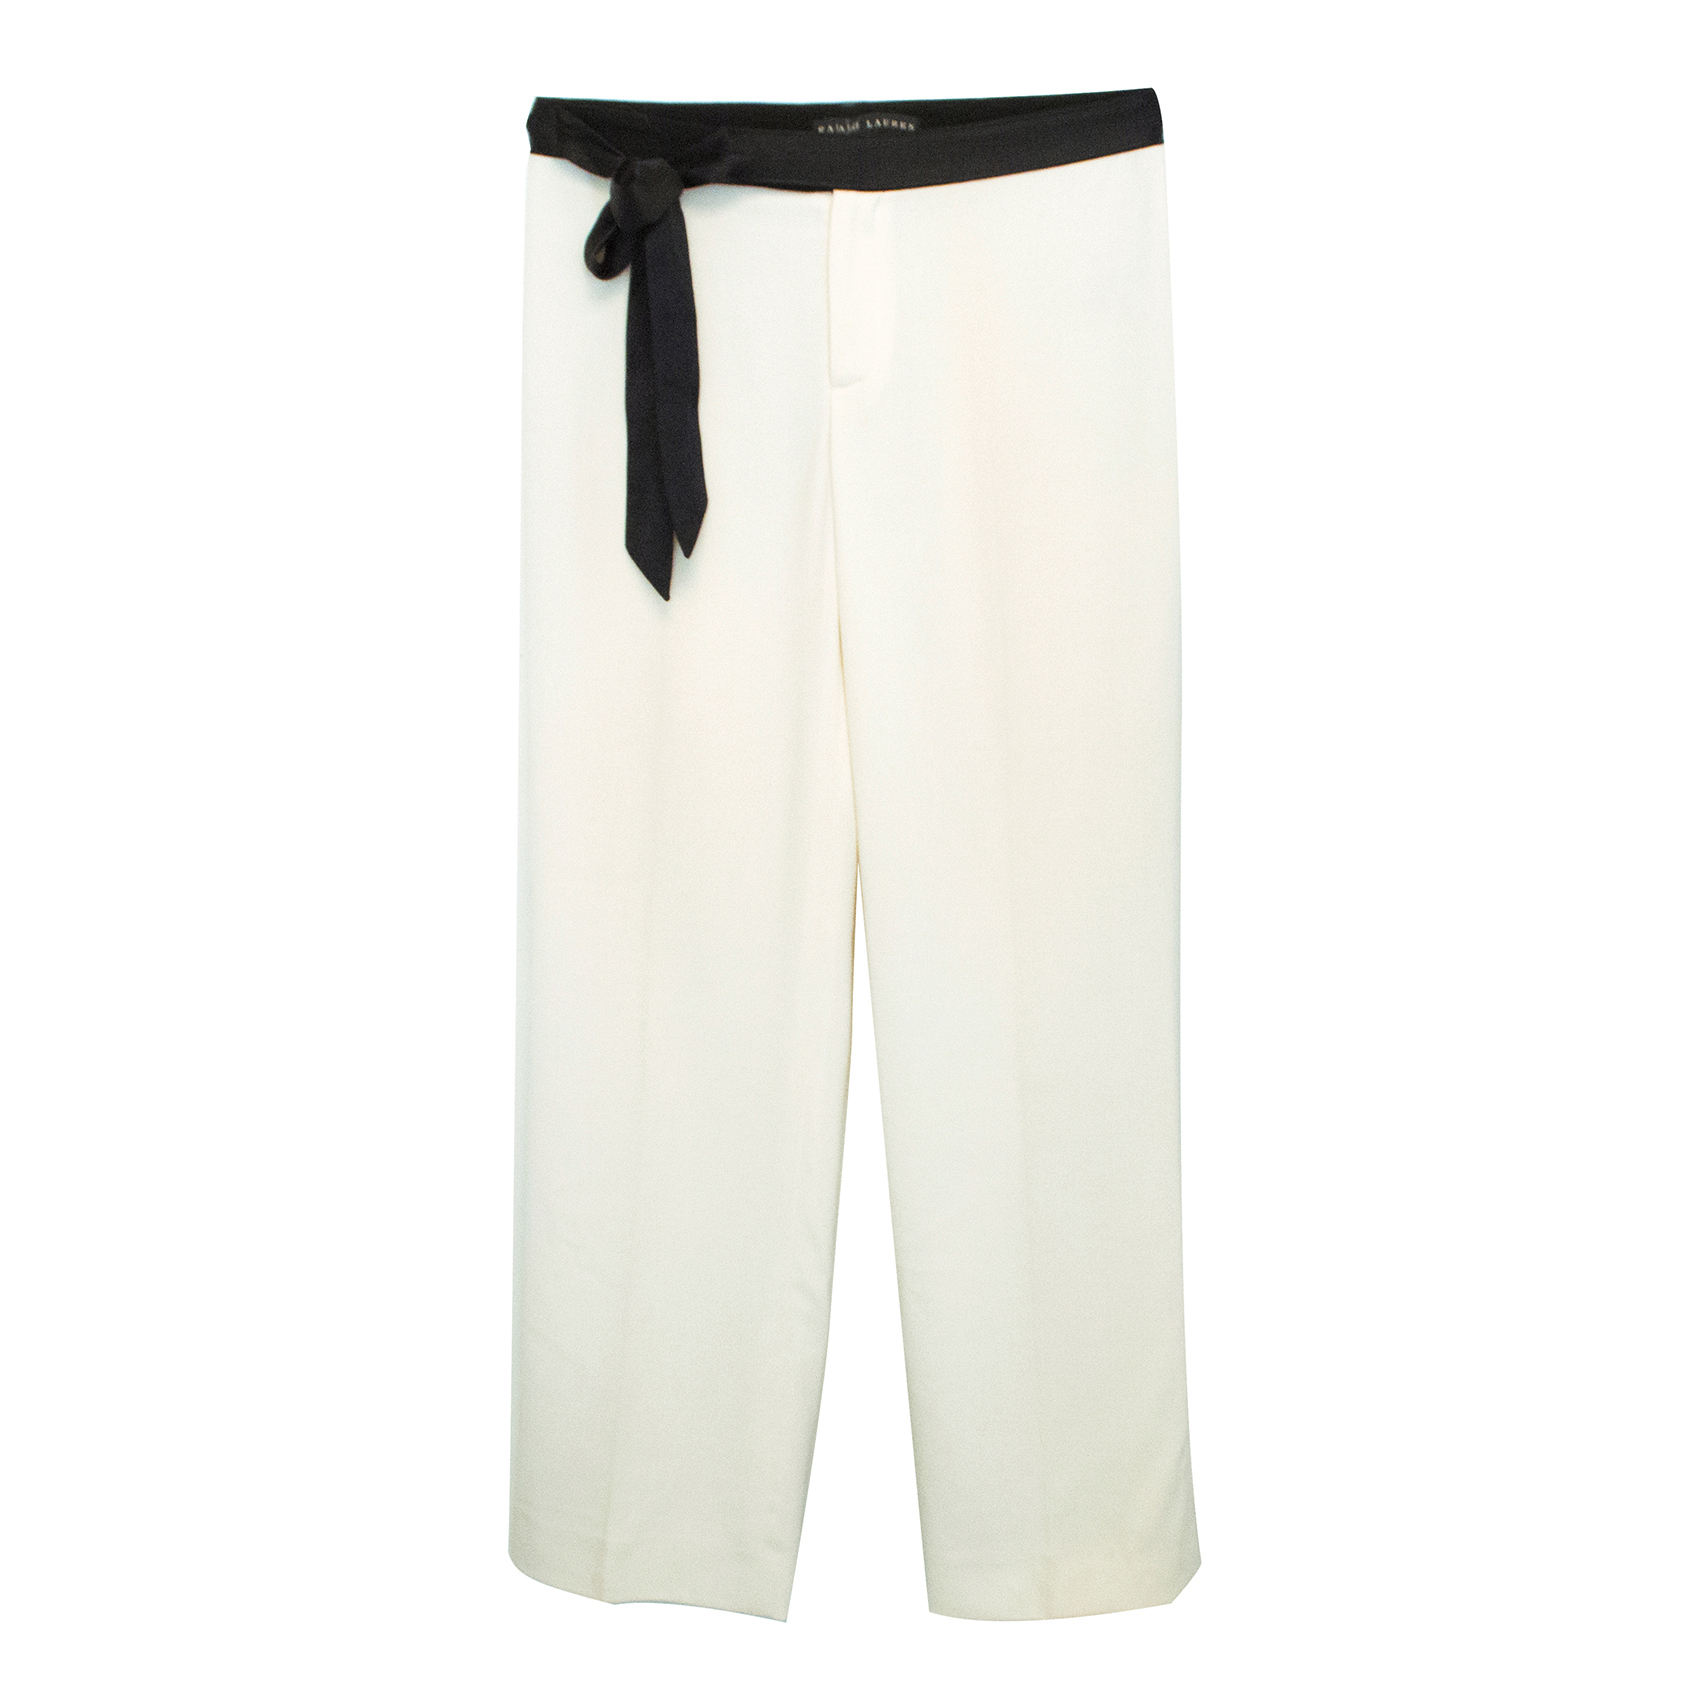 Ralph Lauren Cream Wool Trousers With Black Satin Belt